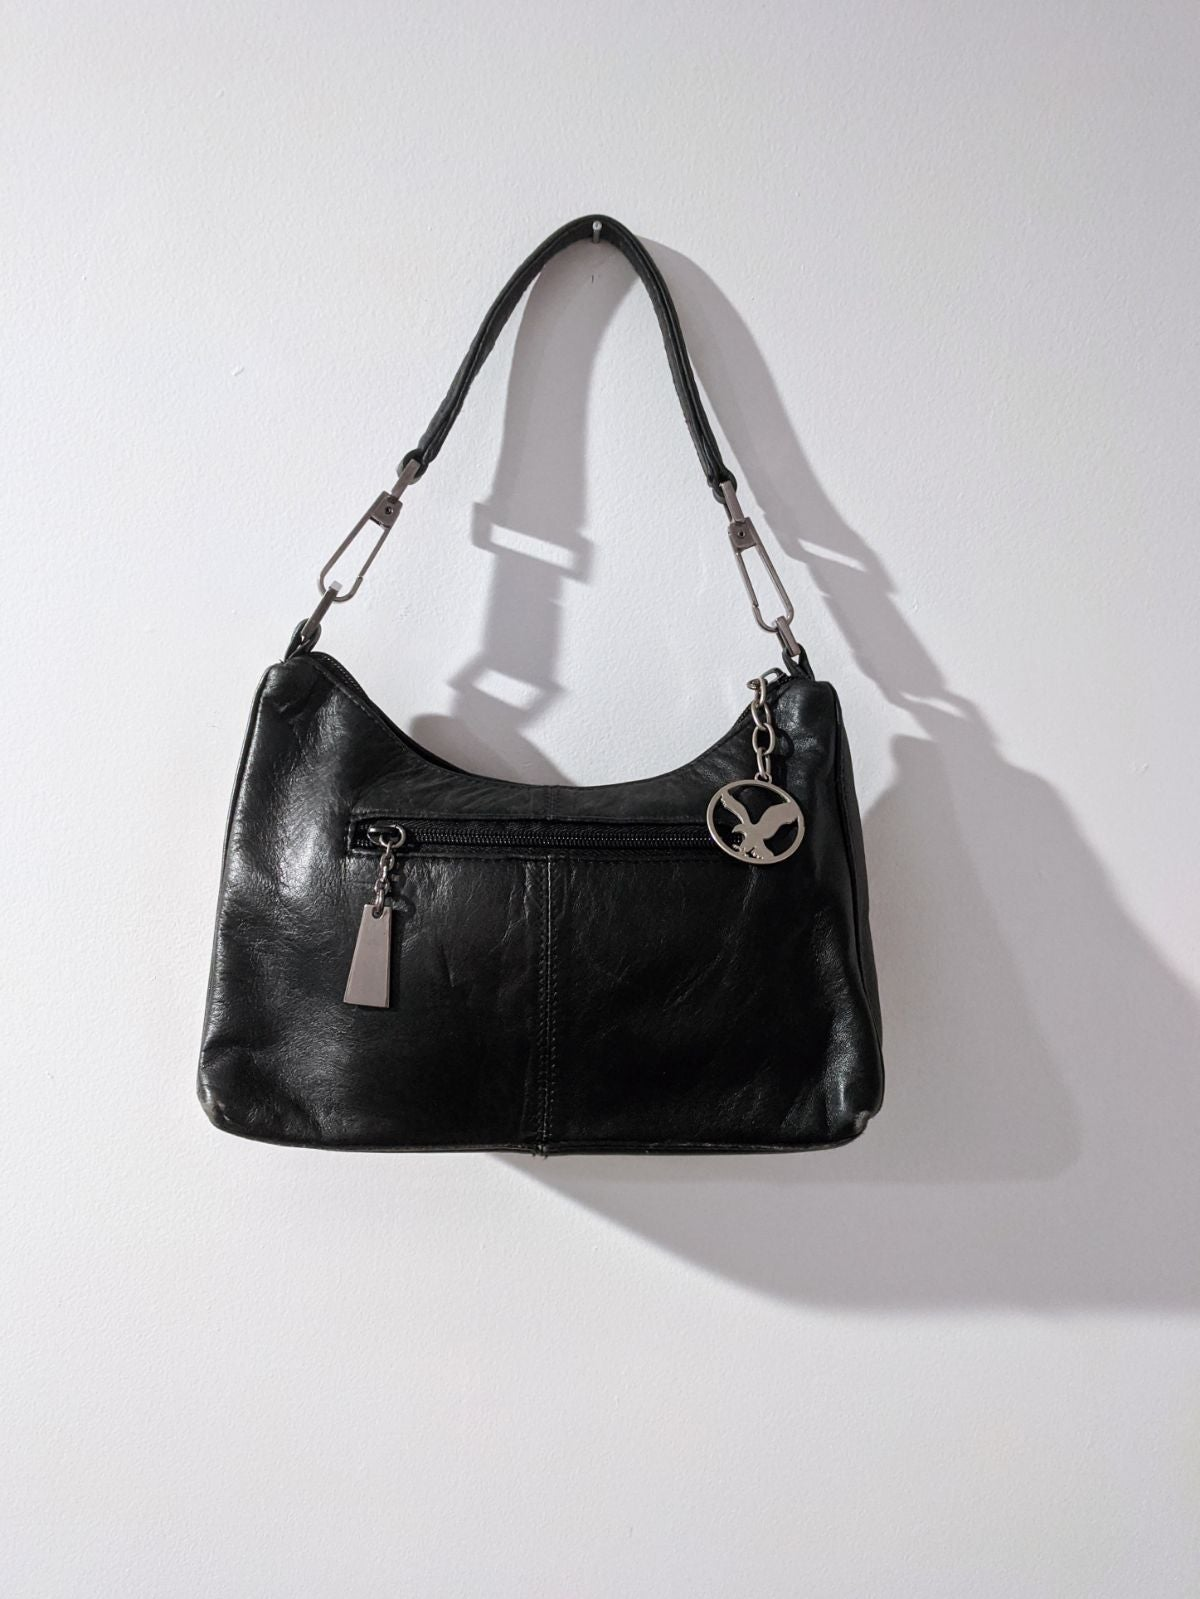 WILSON'S LEATHER 100% Leather Handbag